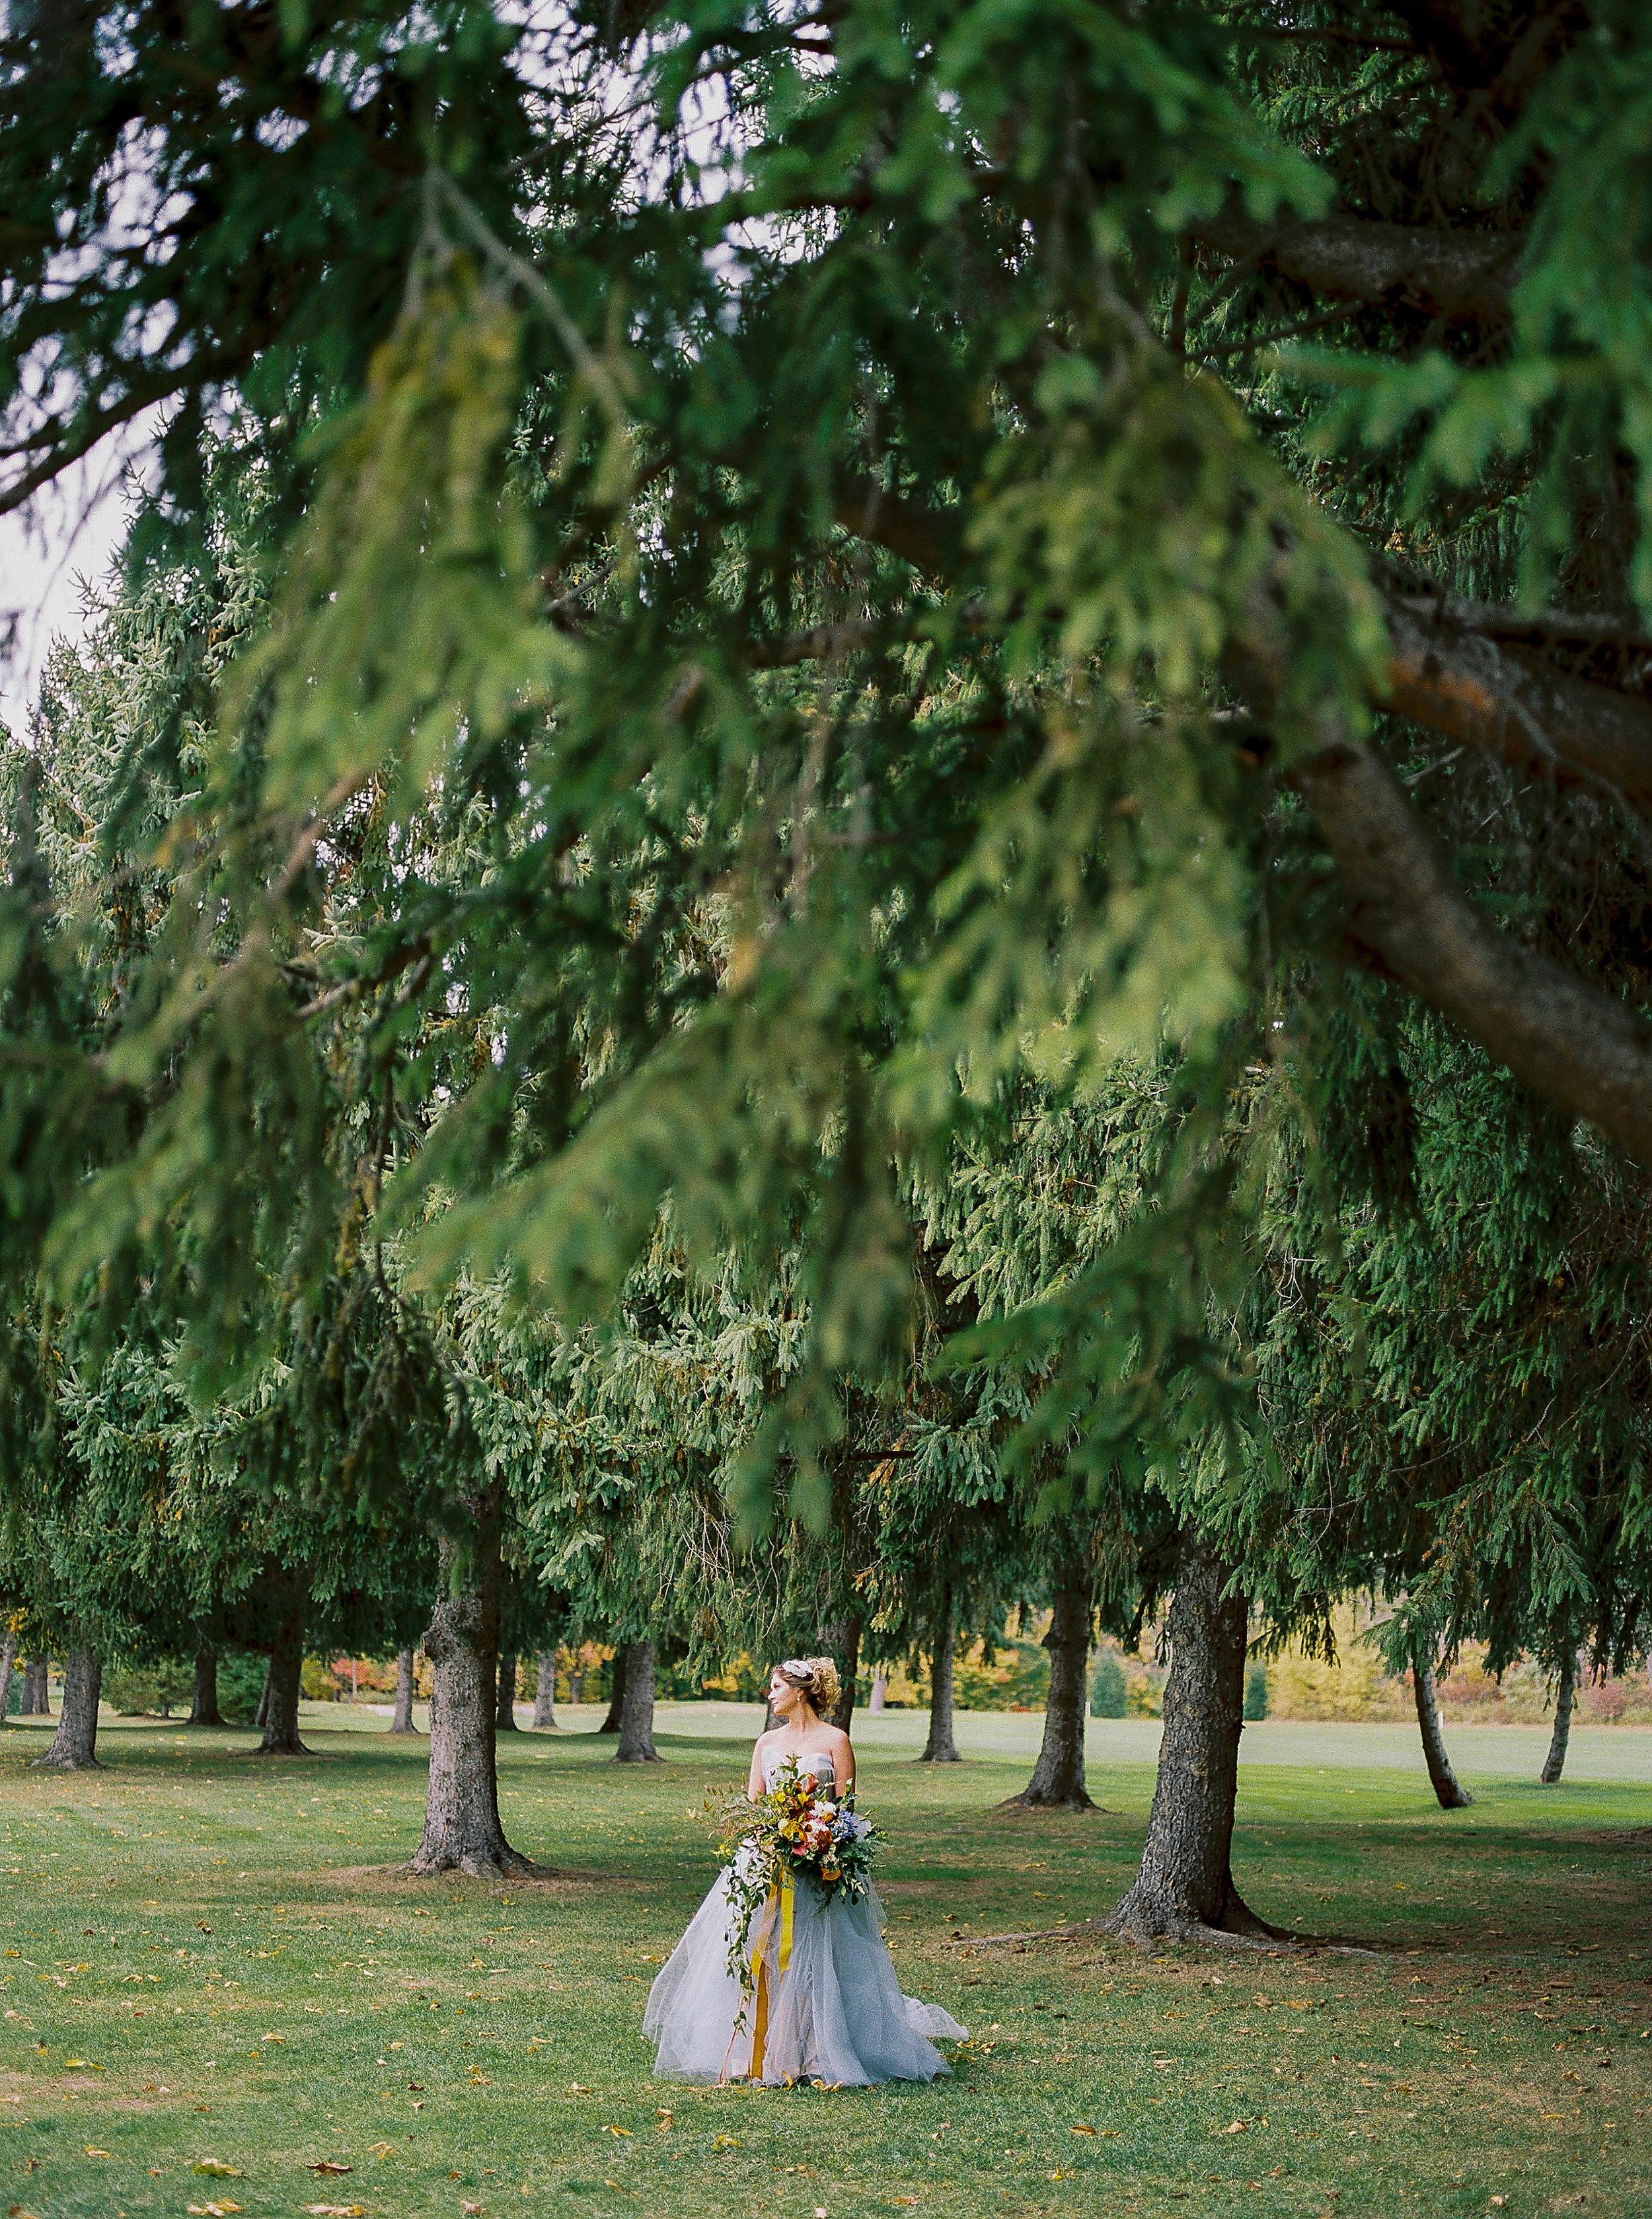 Alexandra-Elise-Photography-Ali-Reed-Film-Wedding-Photographer-Deerfield-Country-Club-085.jpg